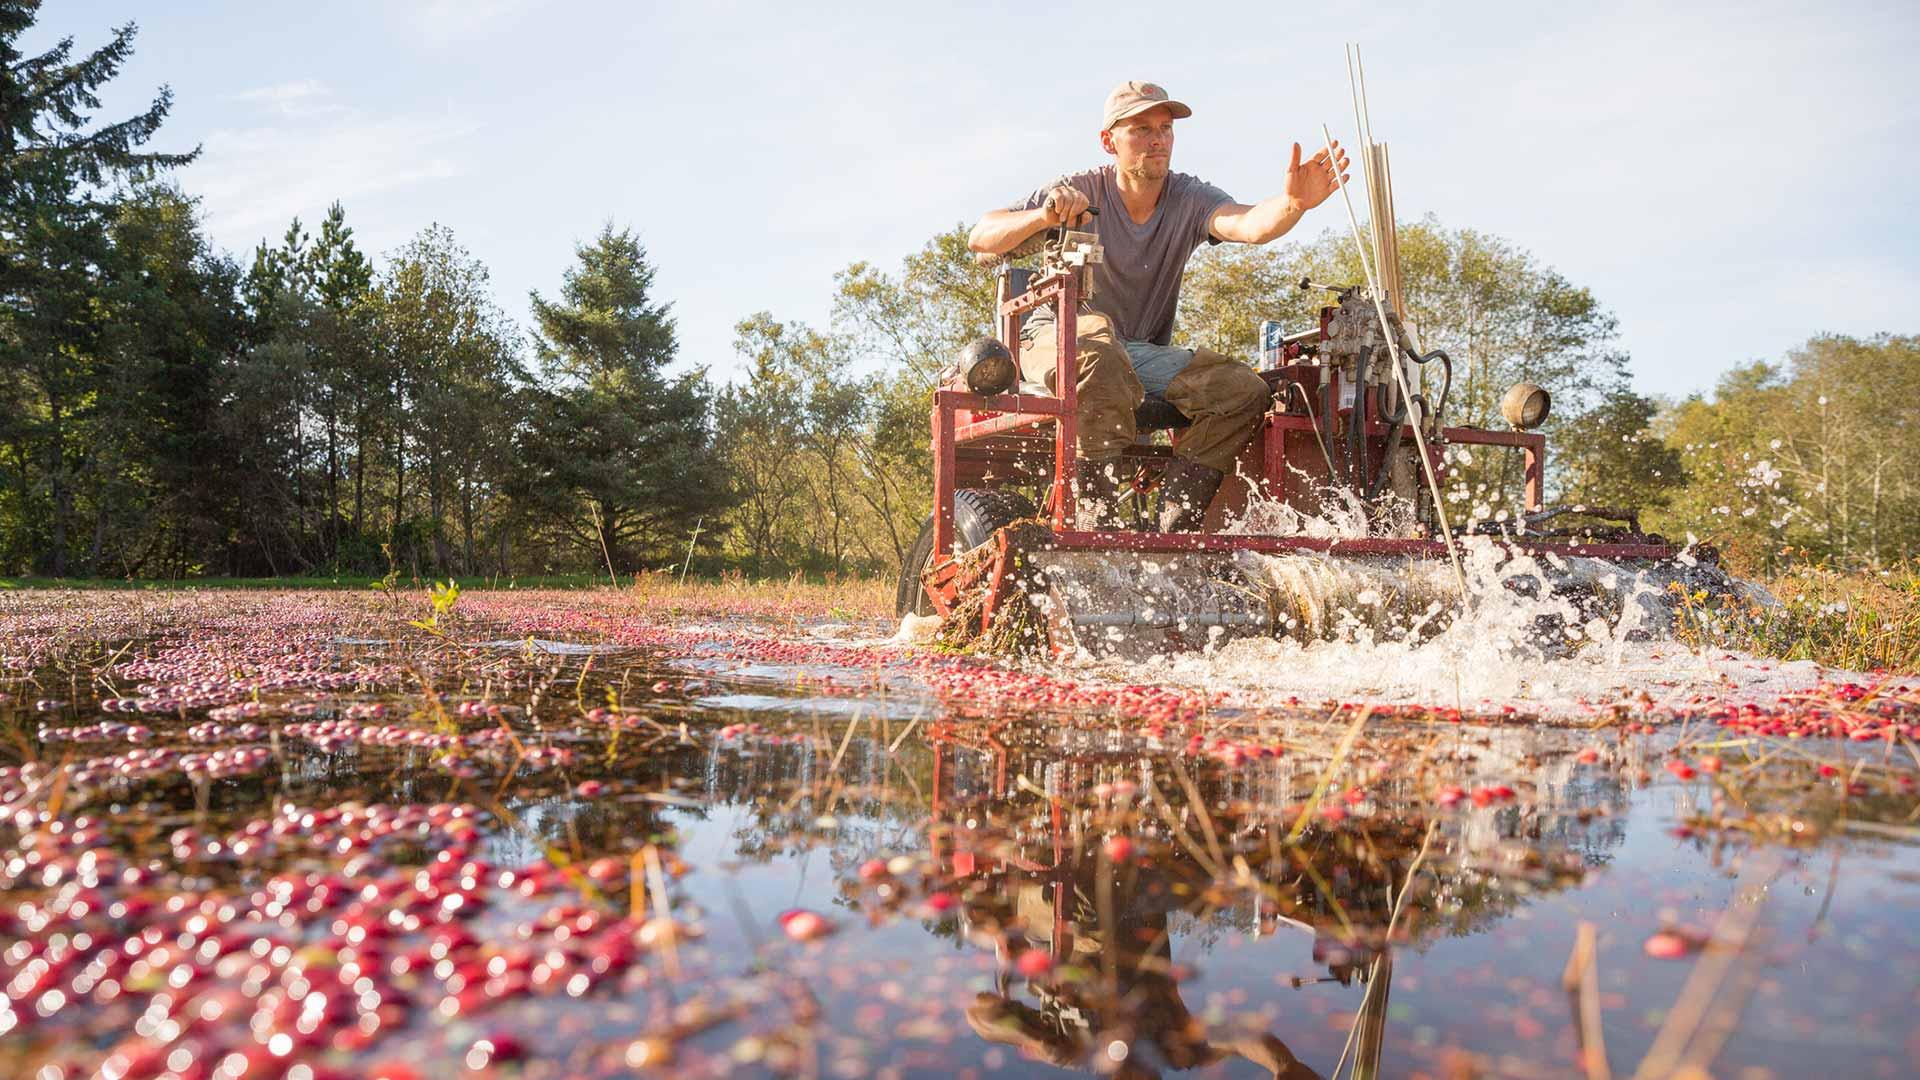 man operates machinery in cranberry bog